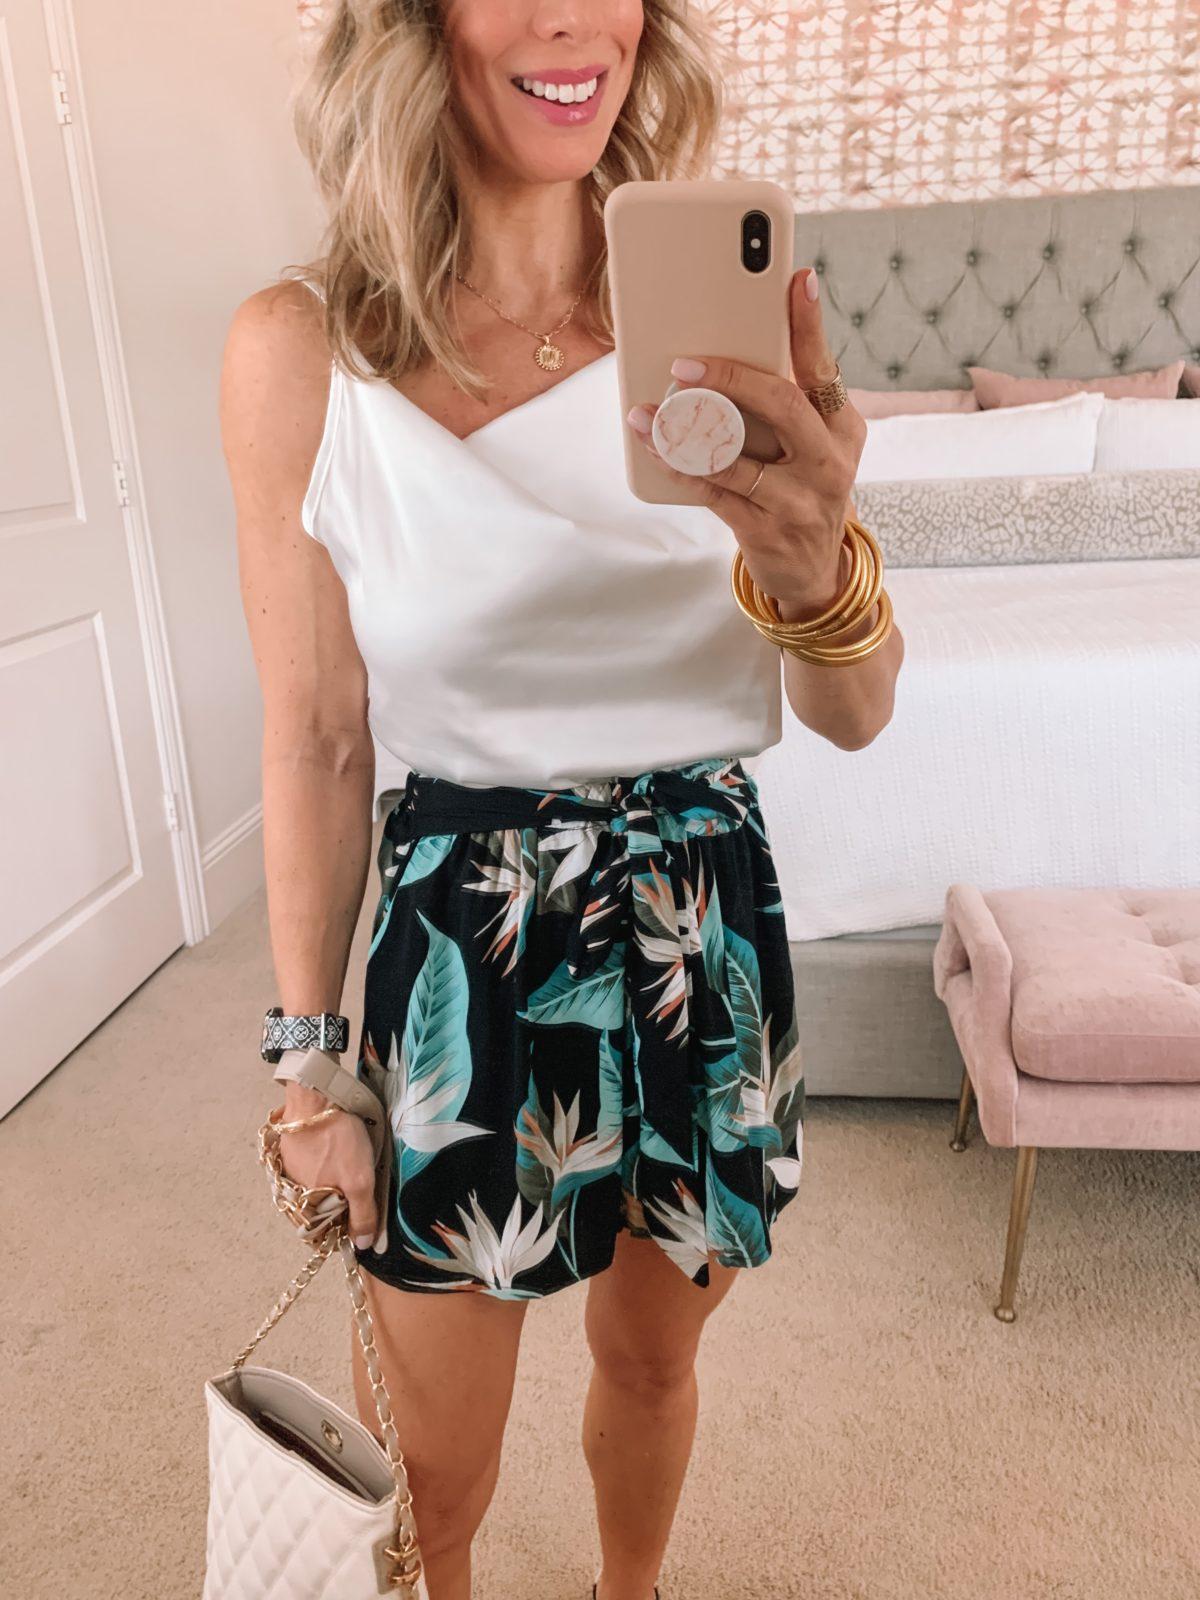 Amazon Fashion Faves, White Cami, Island Print Shorts, Sandals and crossbody